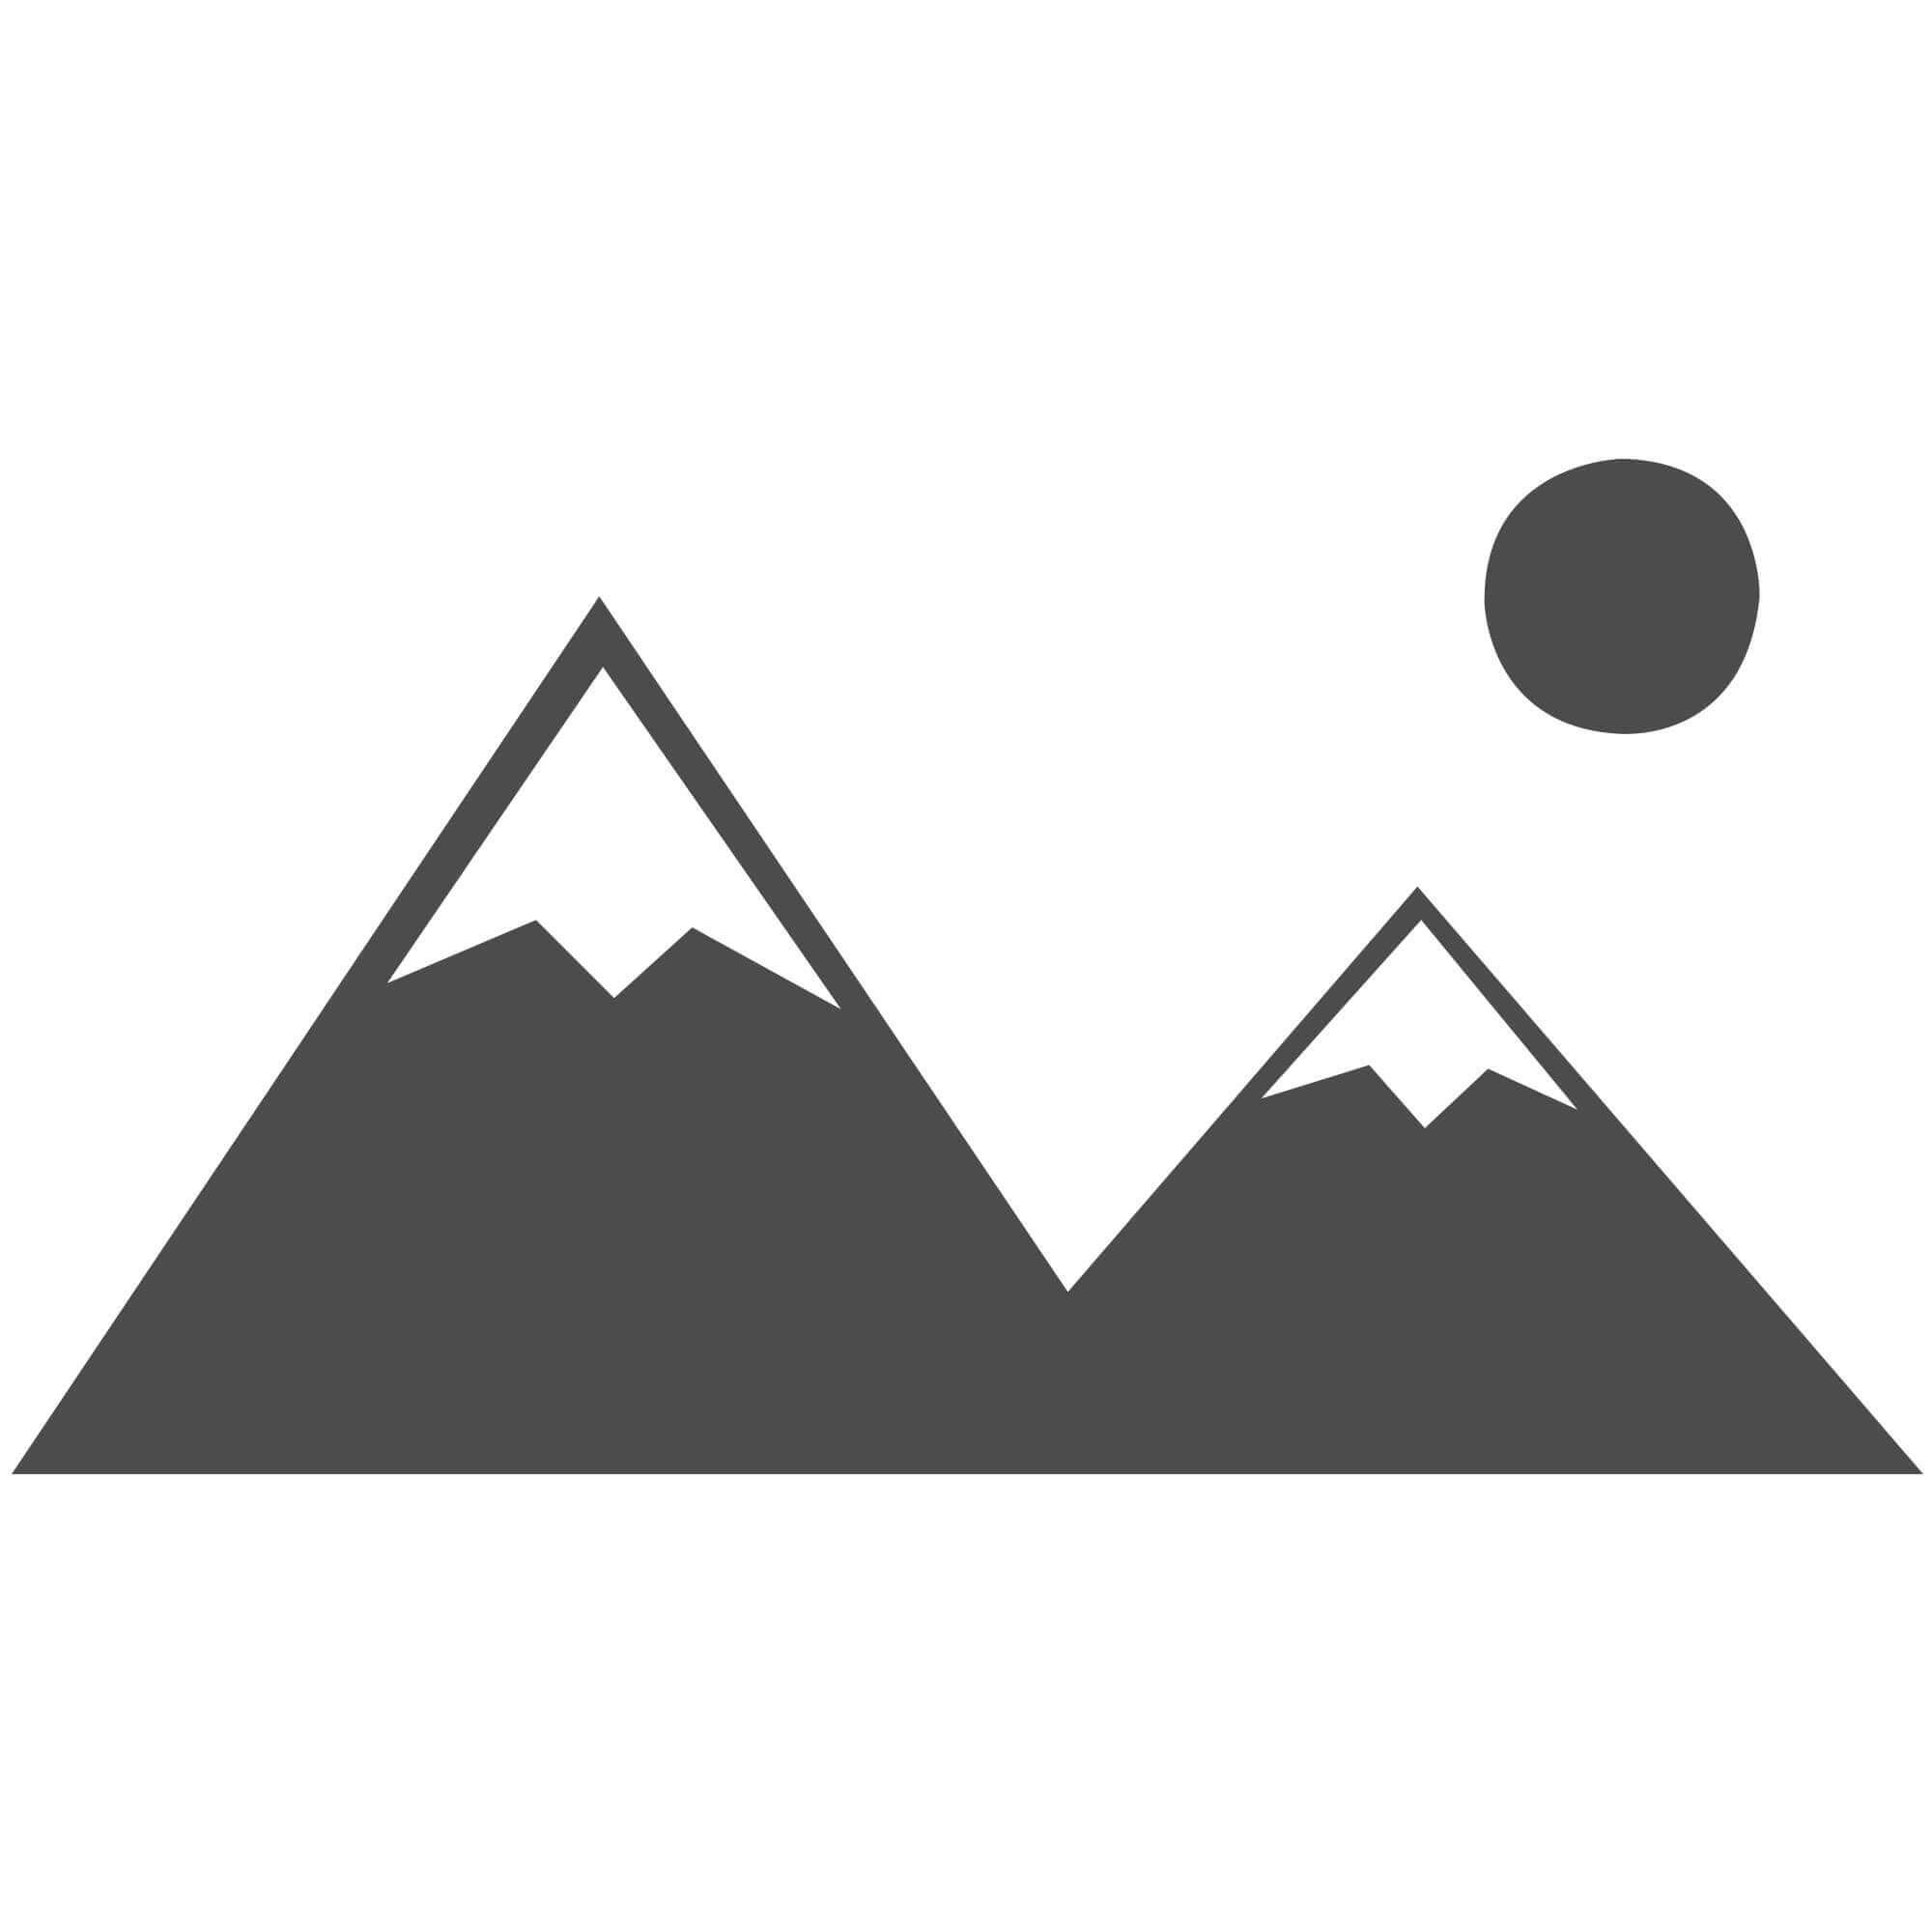 "Sierra Apollo Rug - Red - Square 200 x 200 cm (6'6"" x 6'6"")"